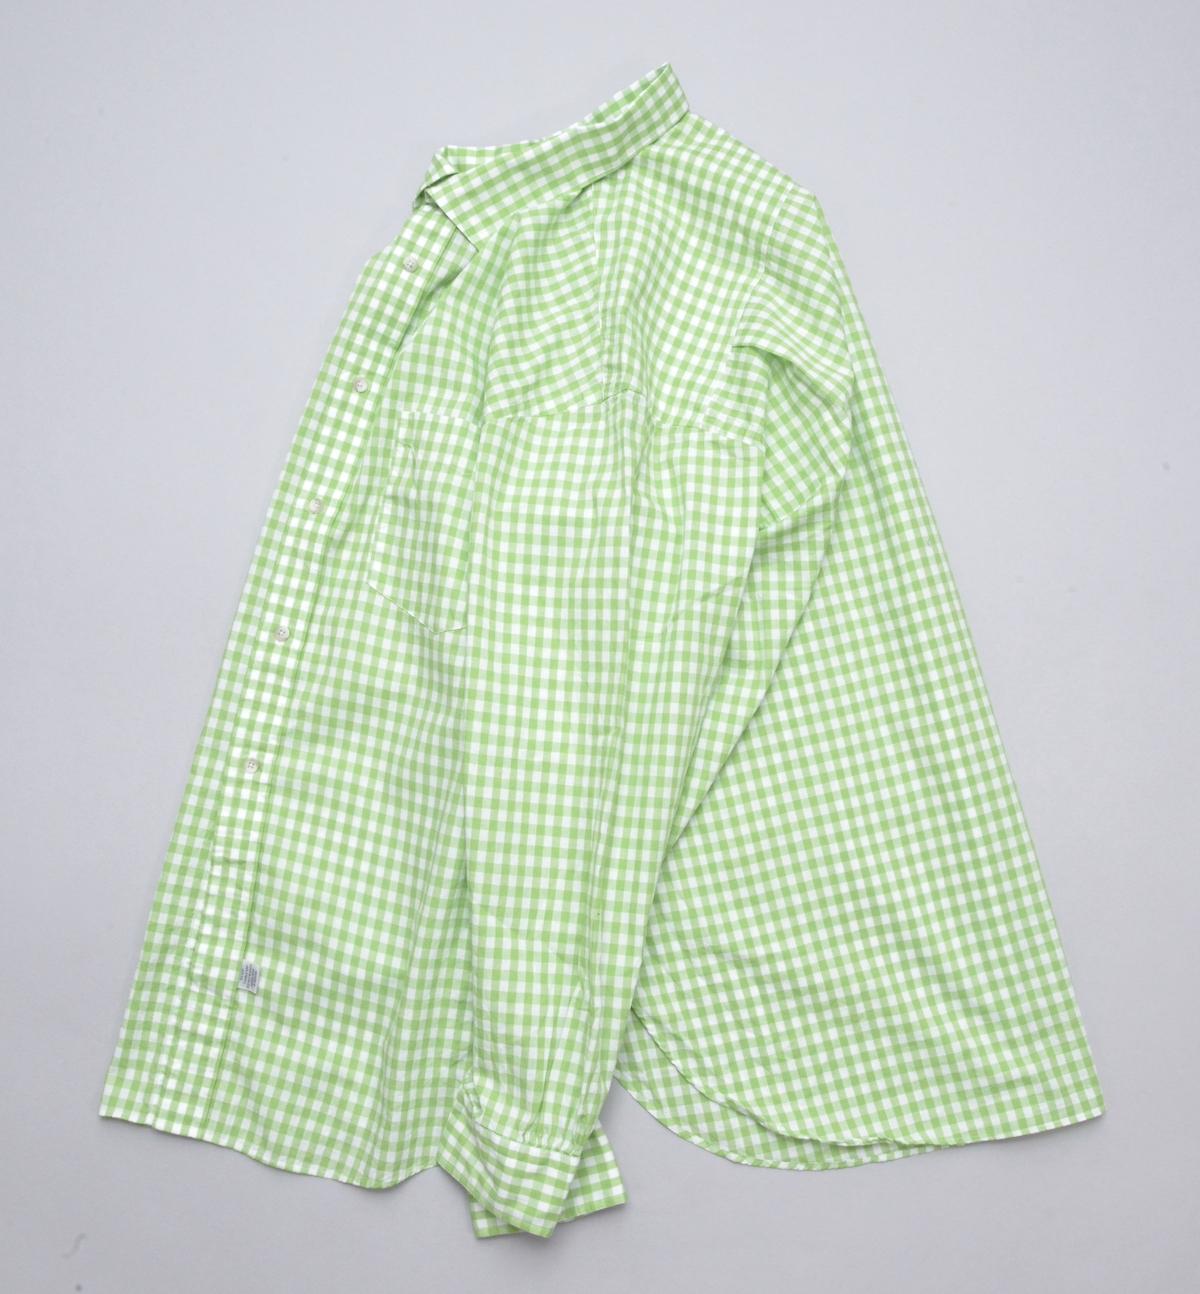 Marvine Pontiak shirt makers 「 Italian Collar SH / Sea Green Gingham 」